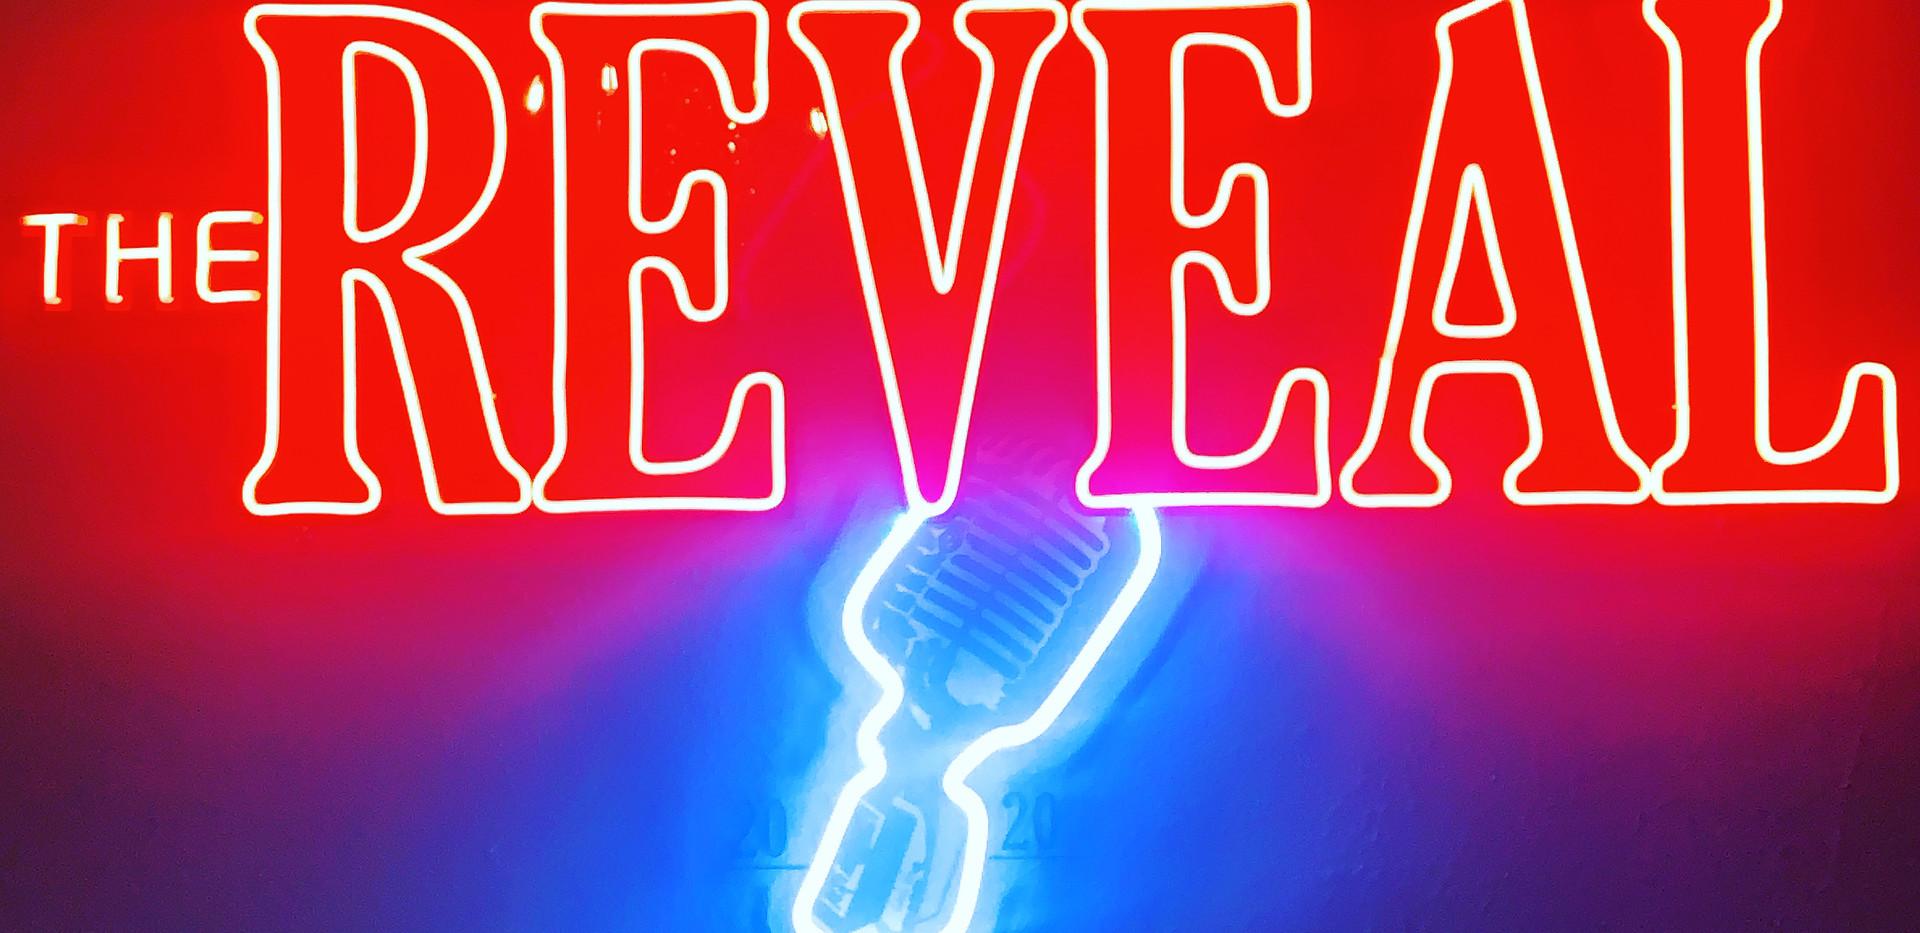 The Reveal Neon